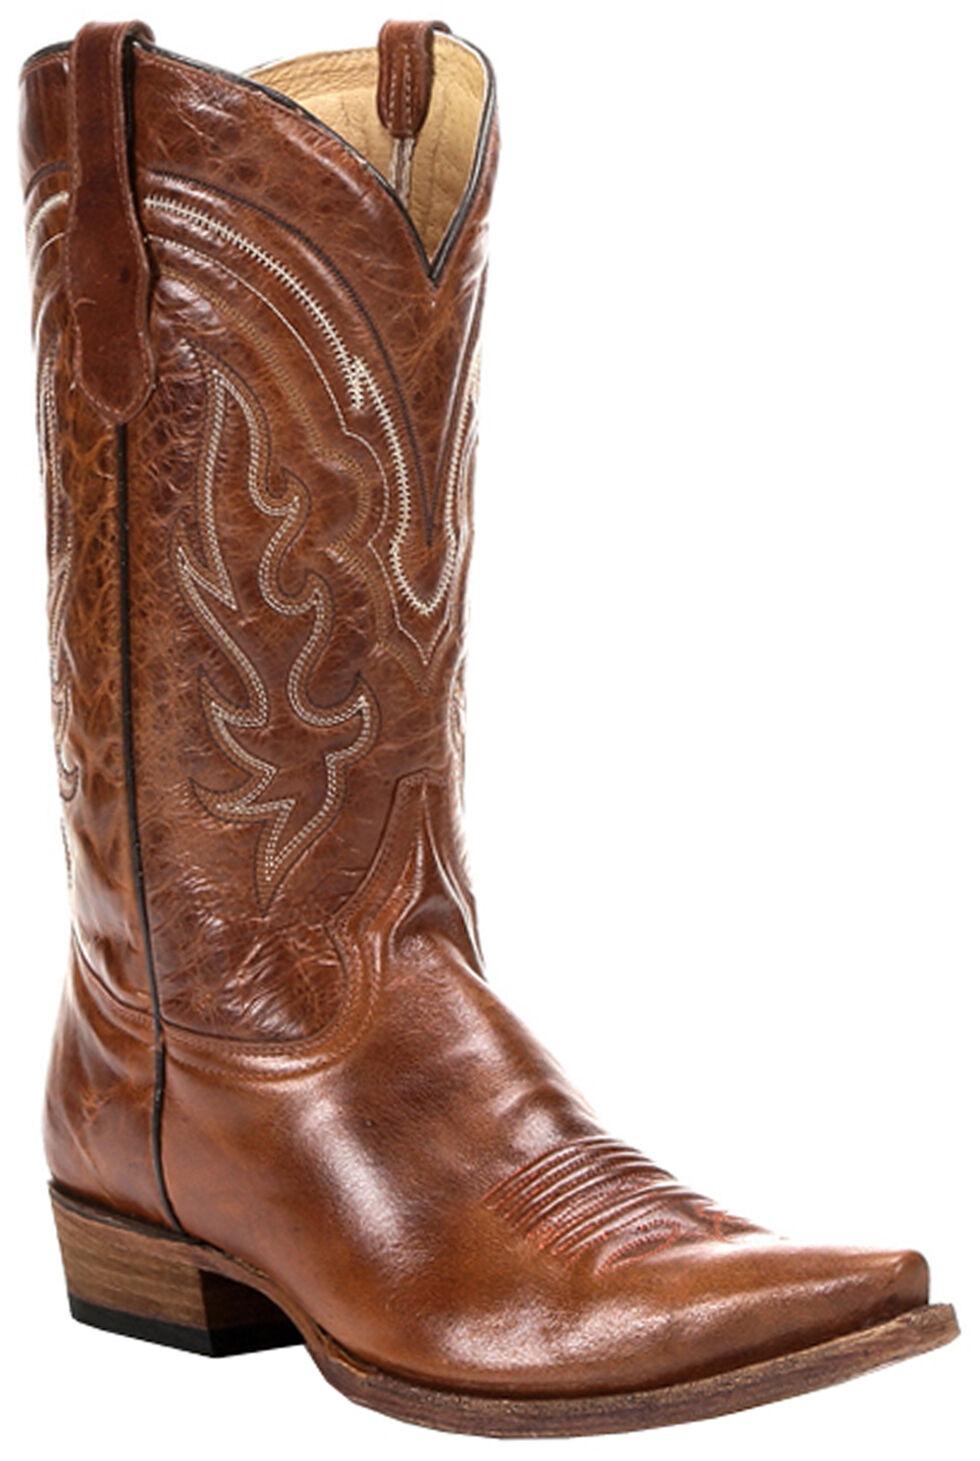 Circle G Men's Whip Stitch Cowboy Boots -  Snip Toe, Cognac, hi-res